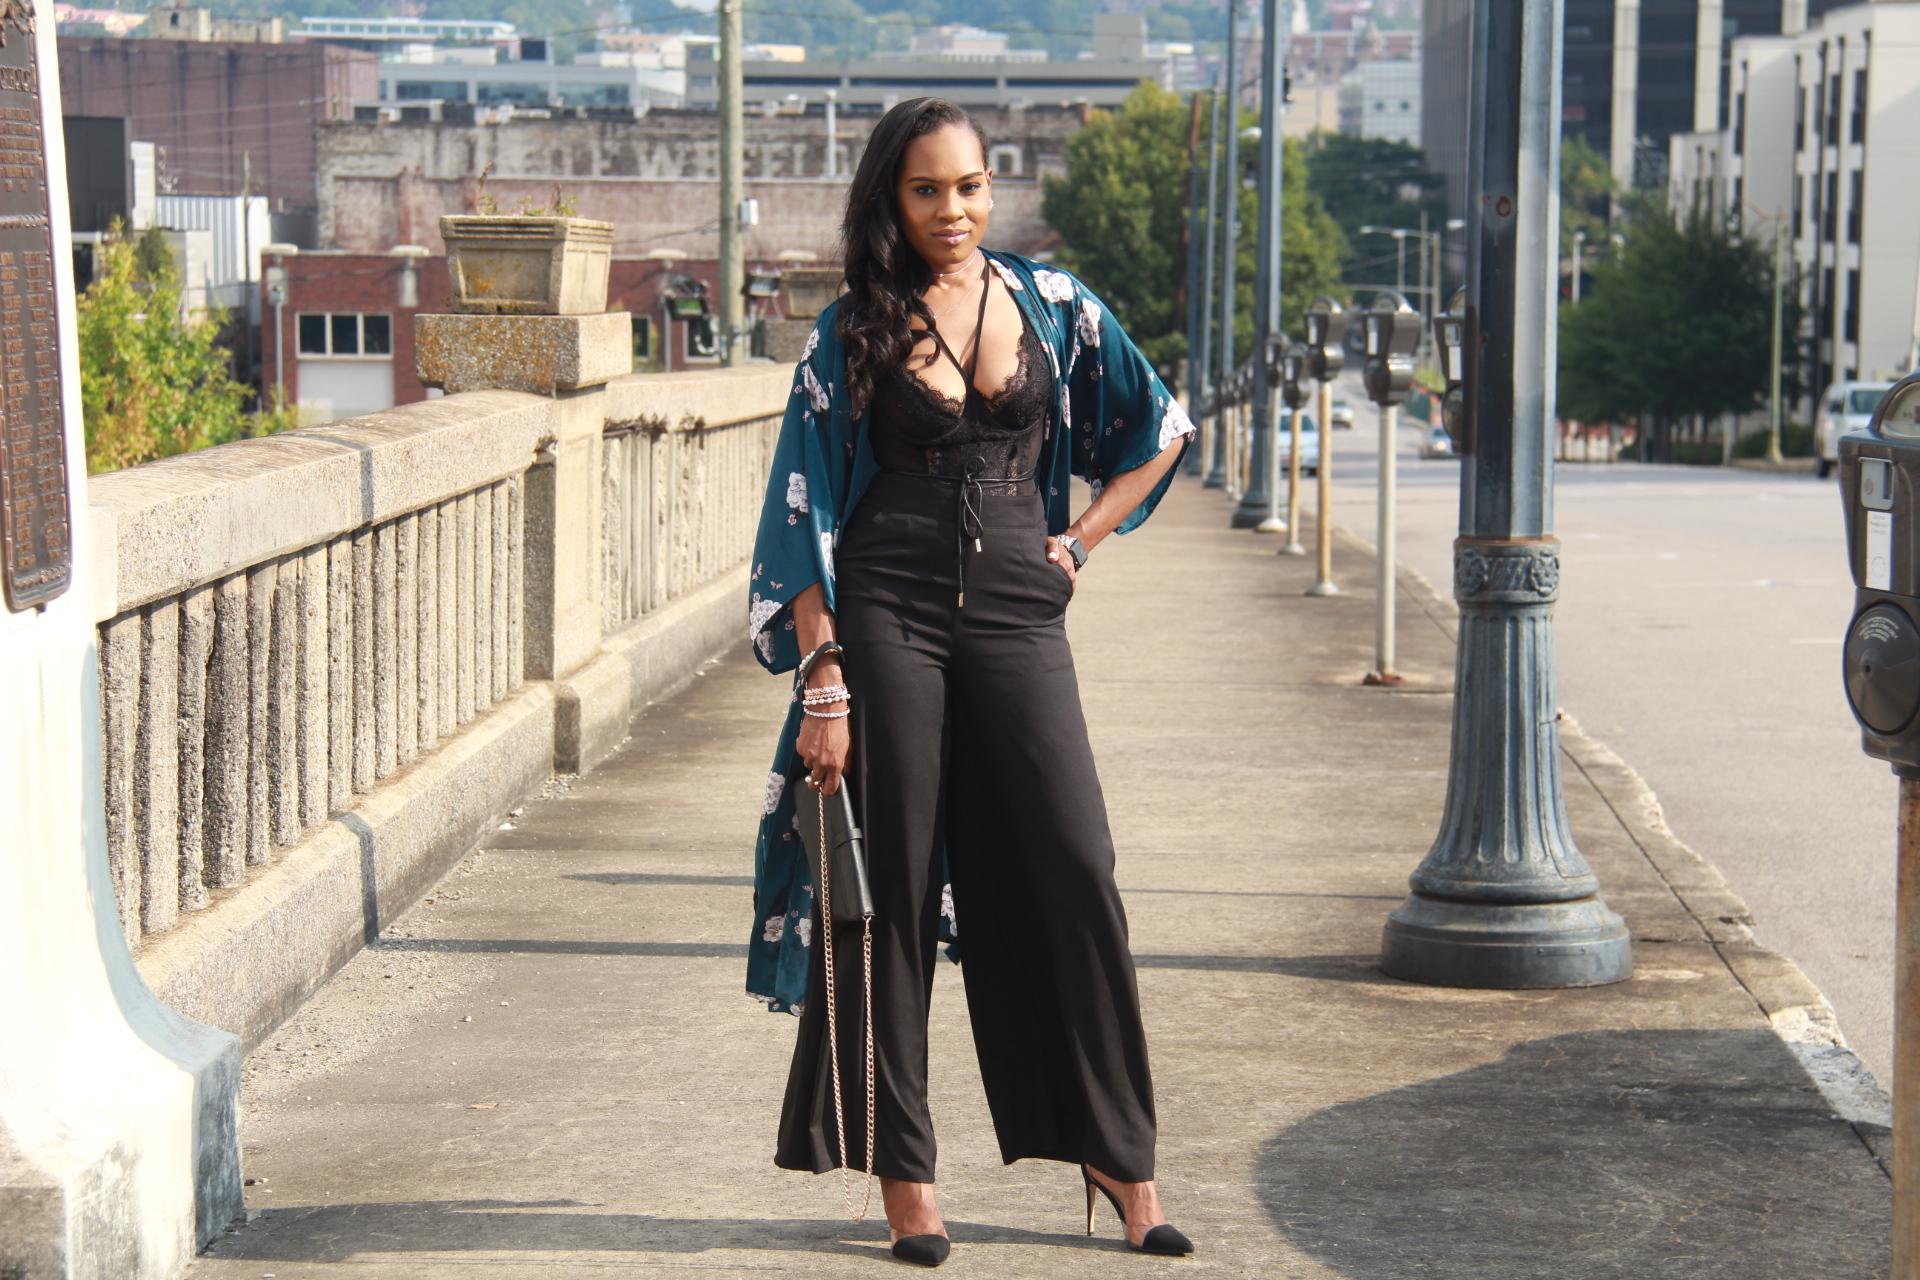 Style-files-Monteau-Green-floral-kimono-Boohoo-Wideleg-pants-zara-pvc-clear-black-pumps-forever21-lace-corset-bodysuit-ooohlalablog-